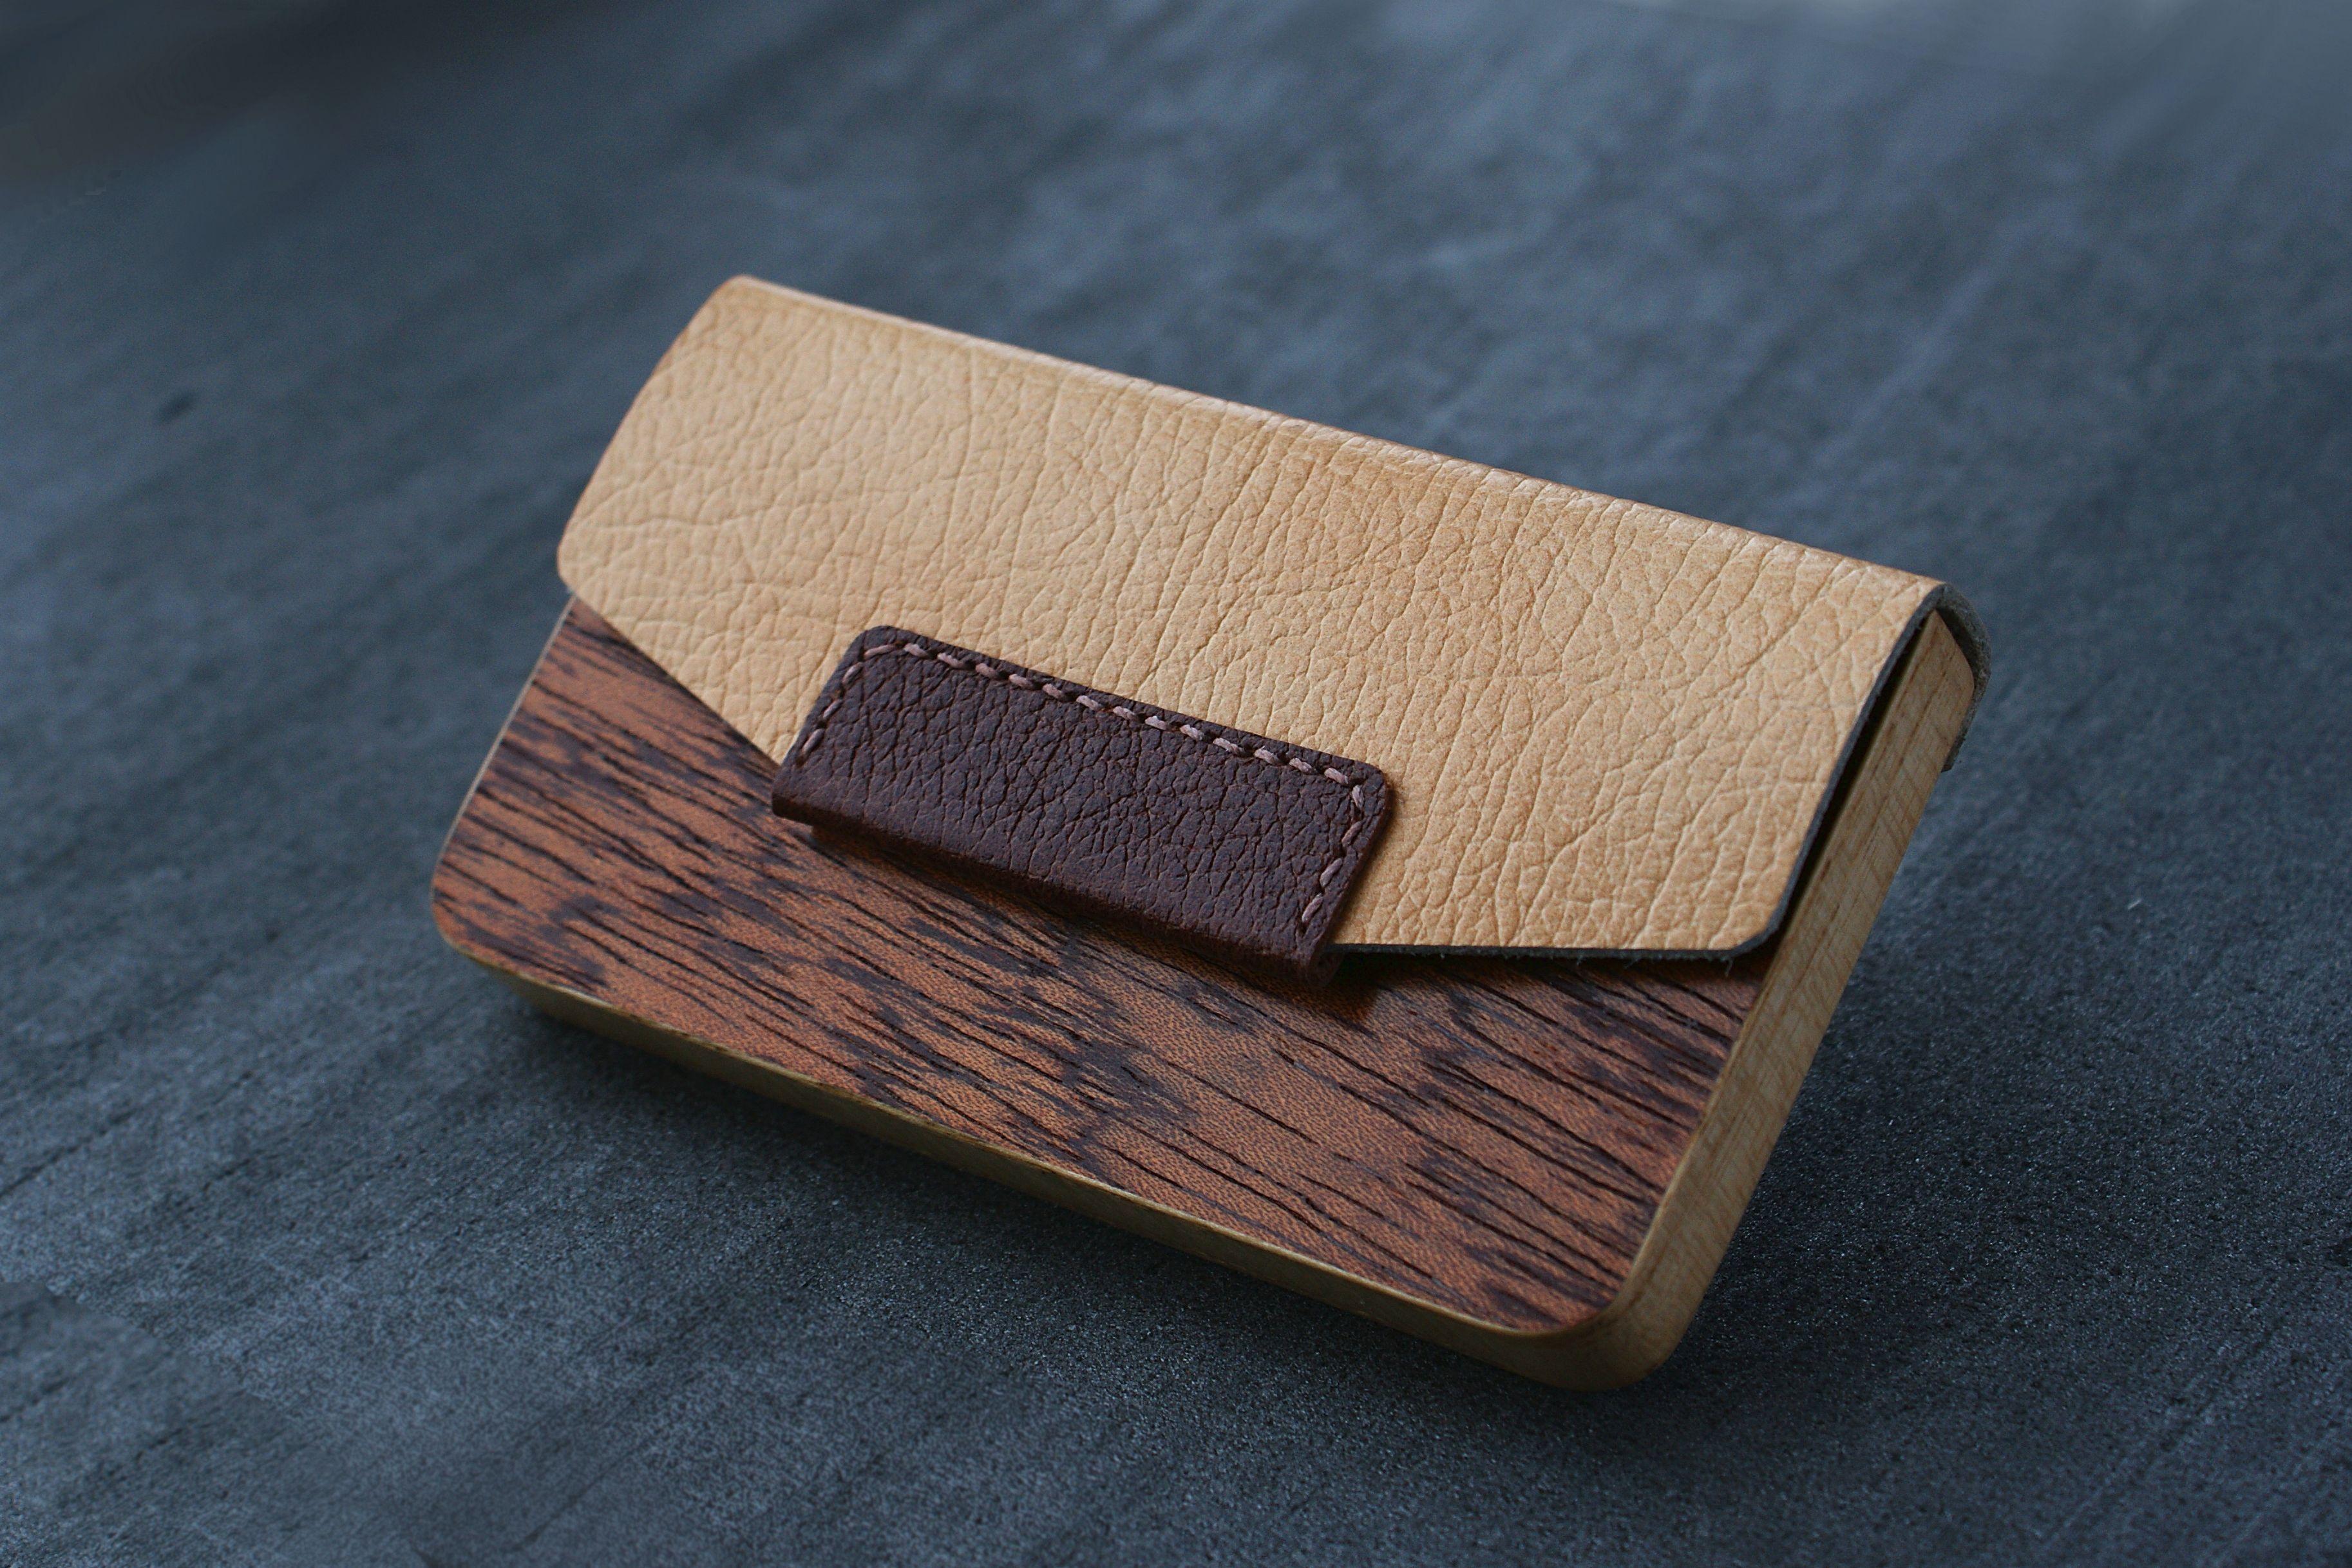 Blazer Luxury Wood Business Cardholder For 15 20 Business Cards Leather Busines Leather Business Card Case Leather Business Cards Leather Business Card Holder